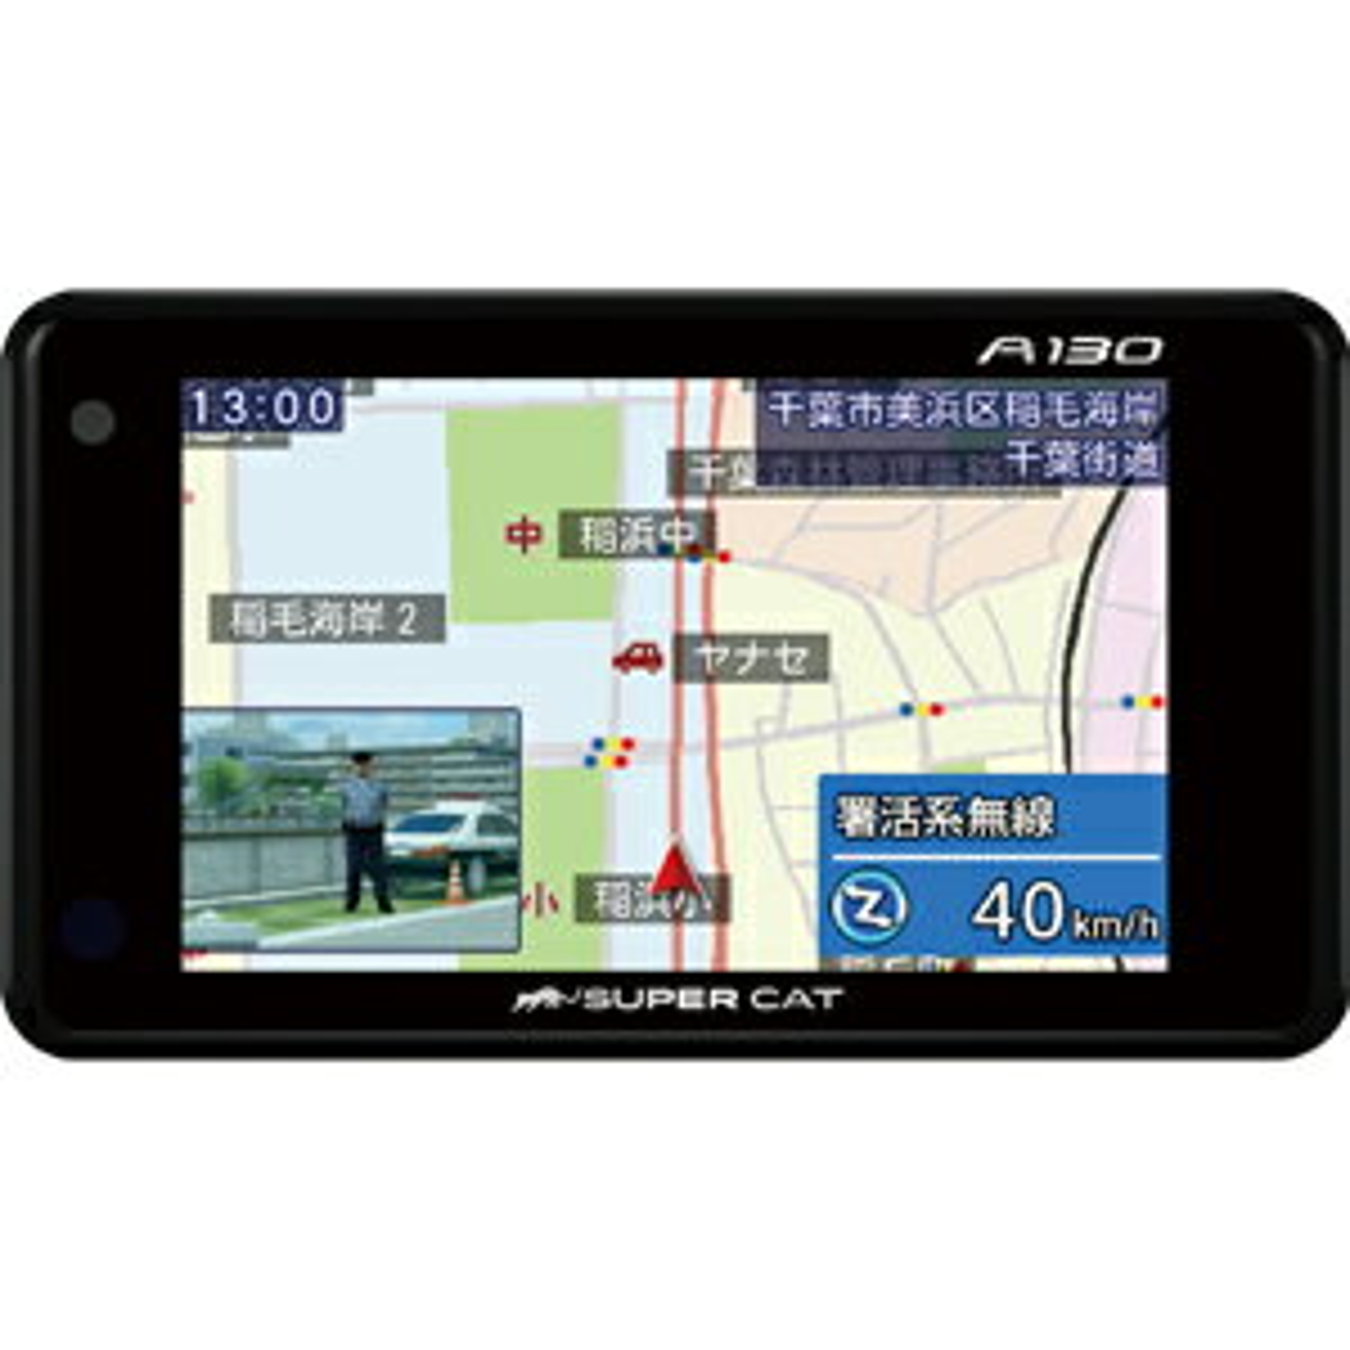 A130 ユピテル レーダー探知機GPS搭載 リモコン付属 YUPITERU Super Cat